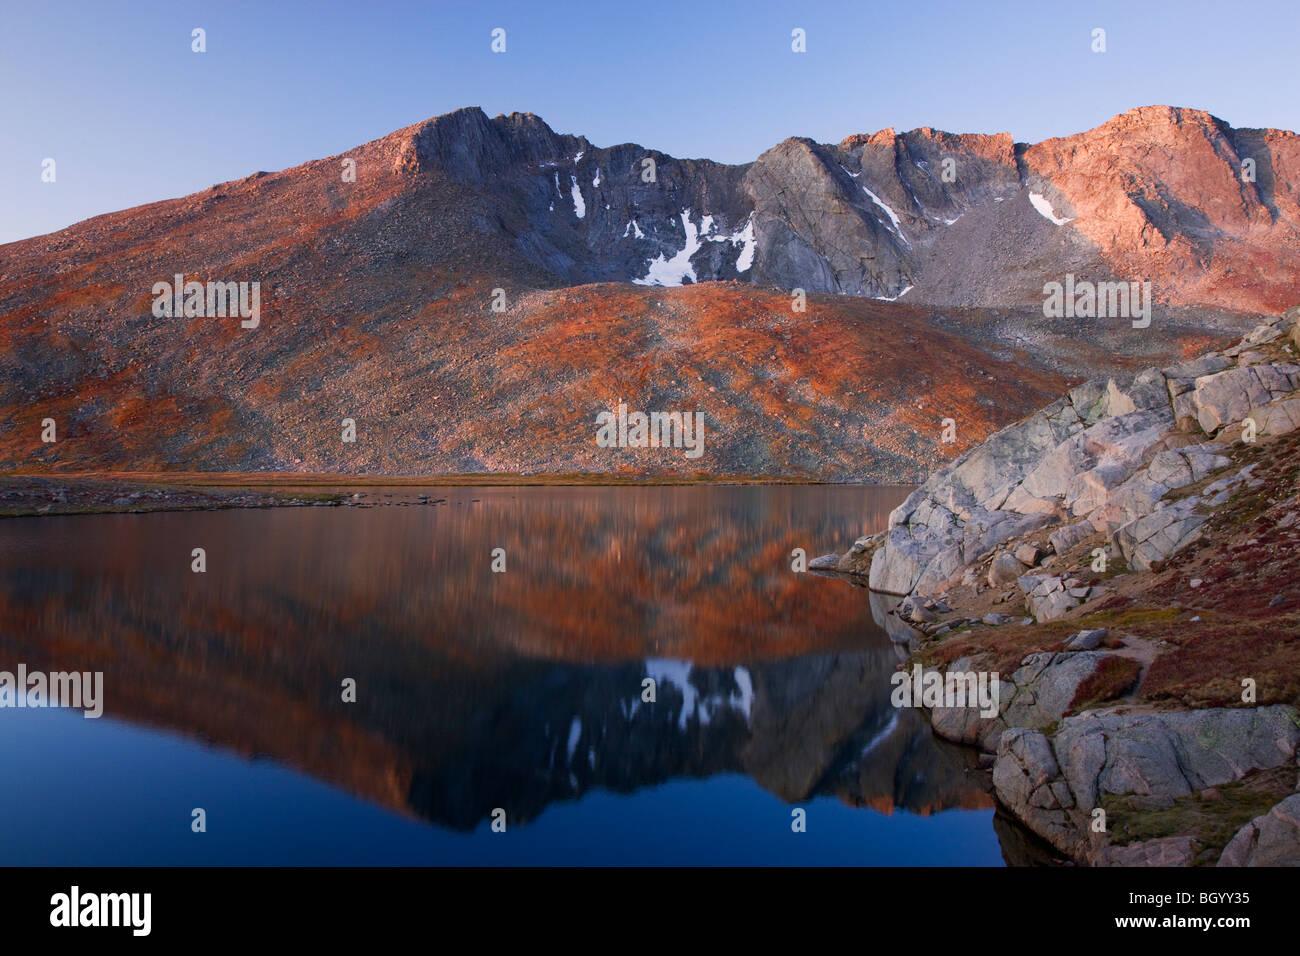 Summit Lake, Mount Evans Recreation Area, Arapaho National Forest, Colorado. - Stock Image